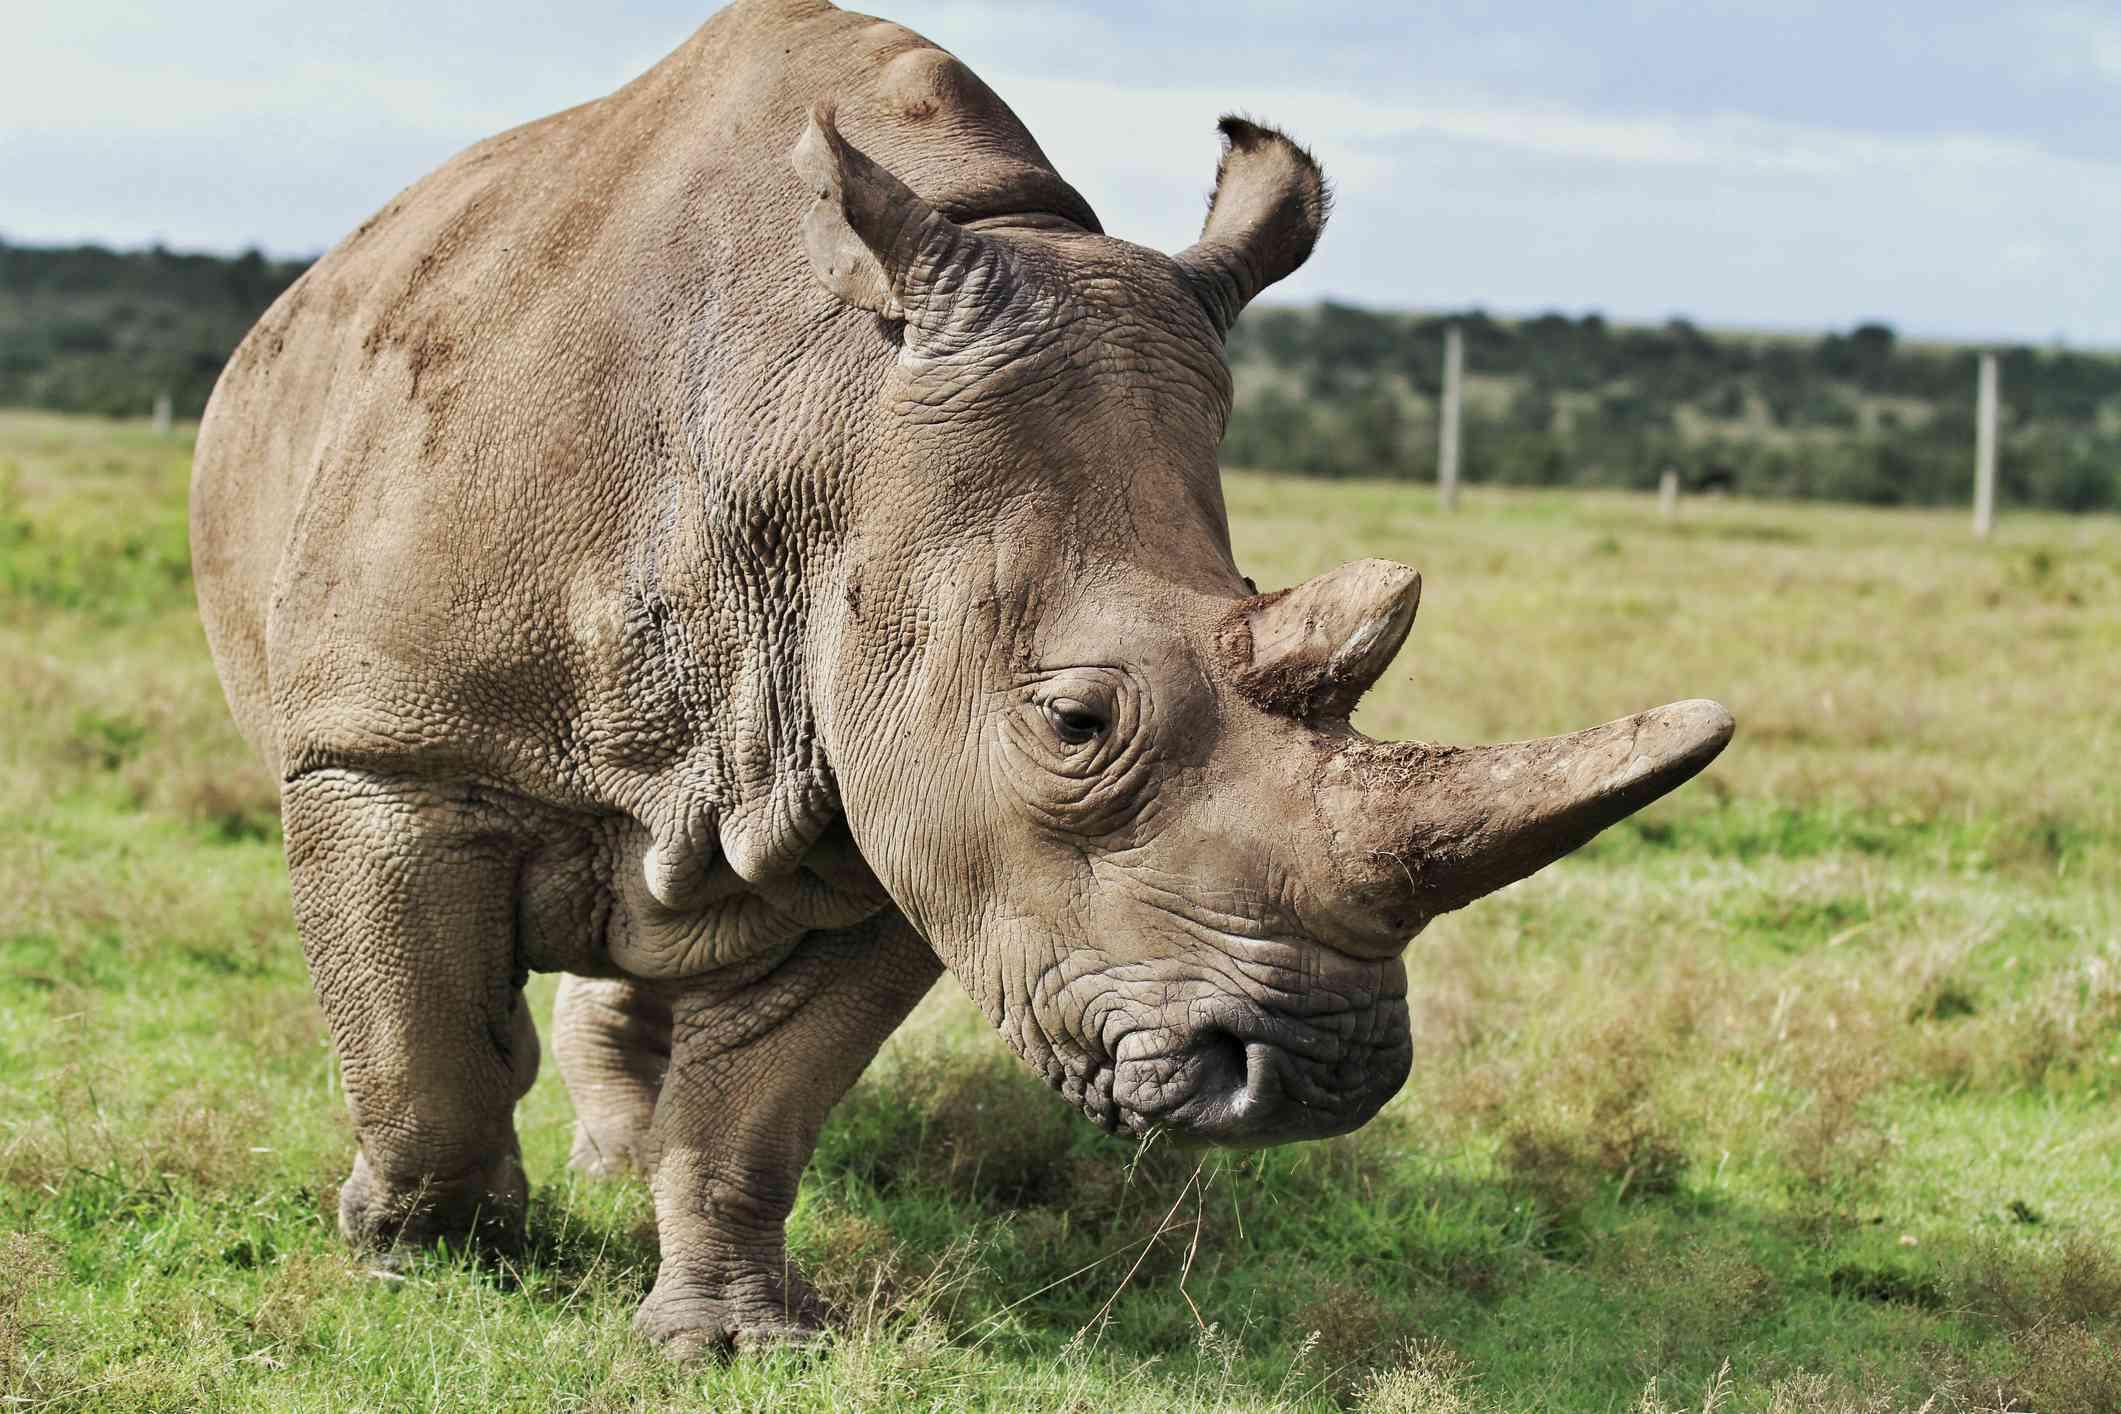 One of the world's last northern white rhinos, Ol Pejeta Conservancy, Kenya